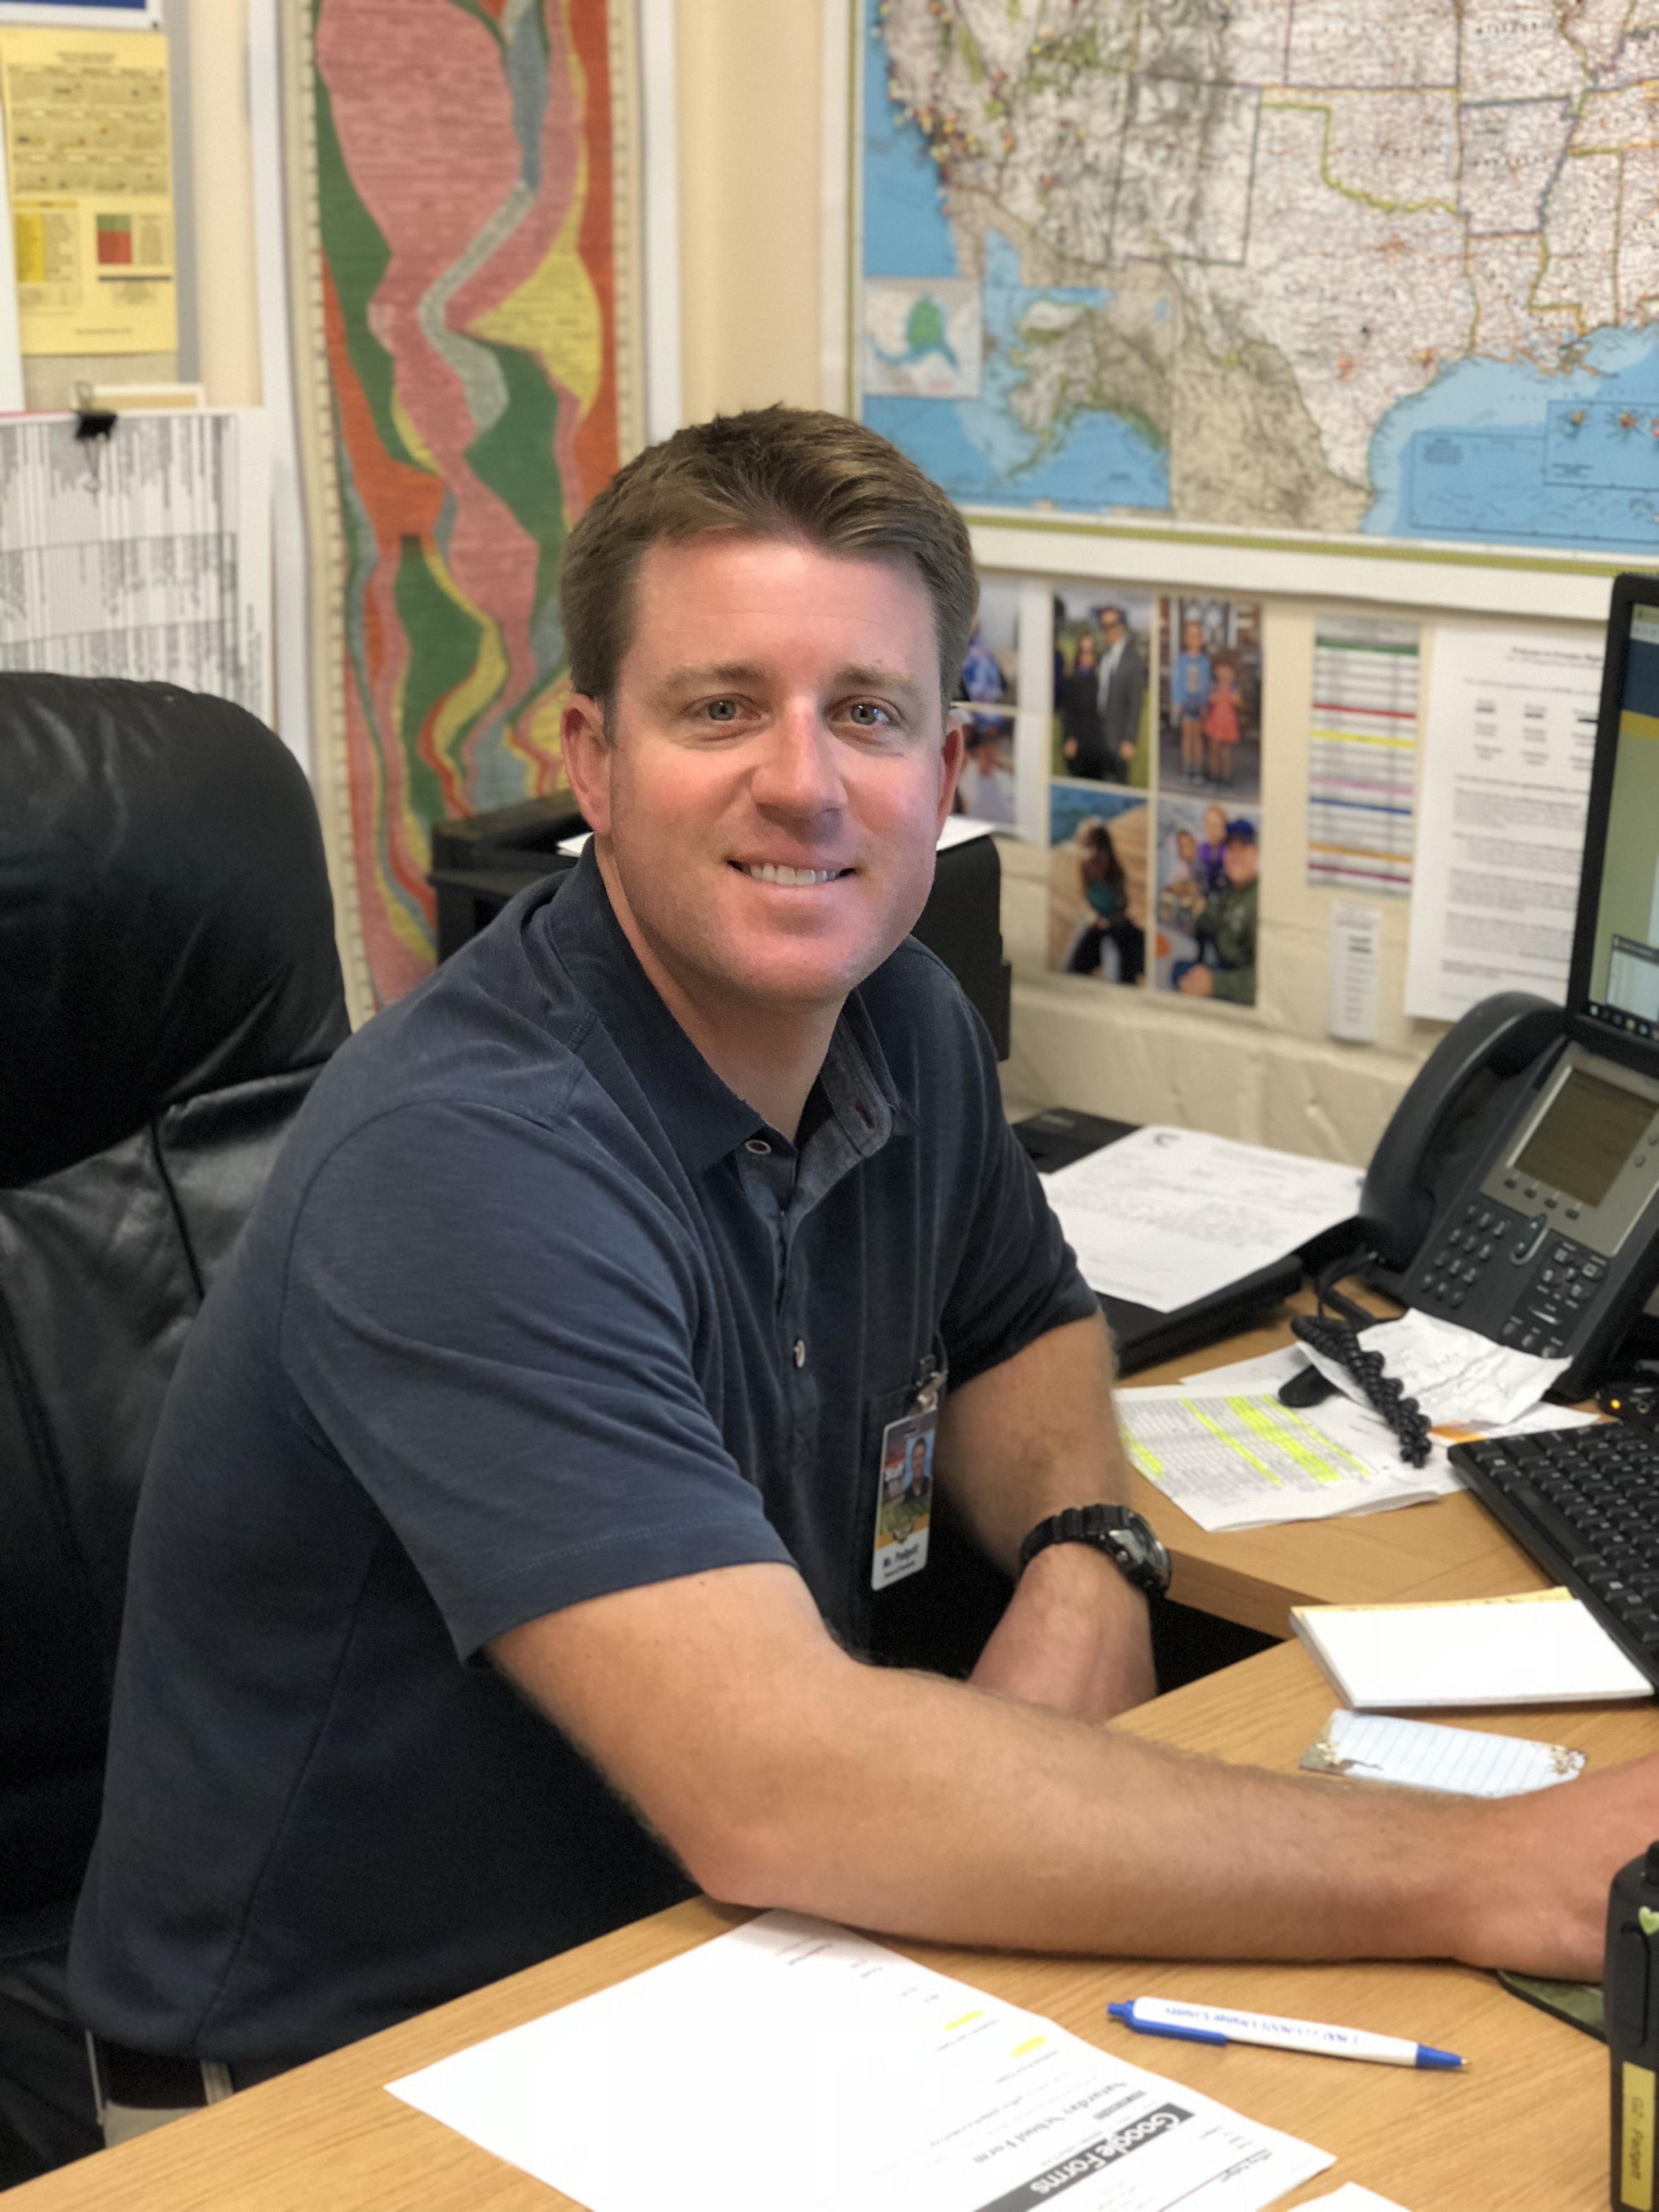 Jeff Padgett, Dean of Students